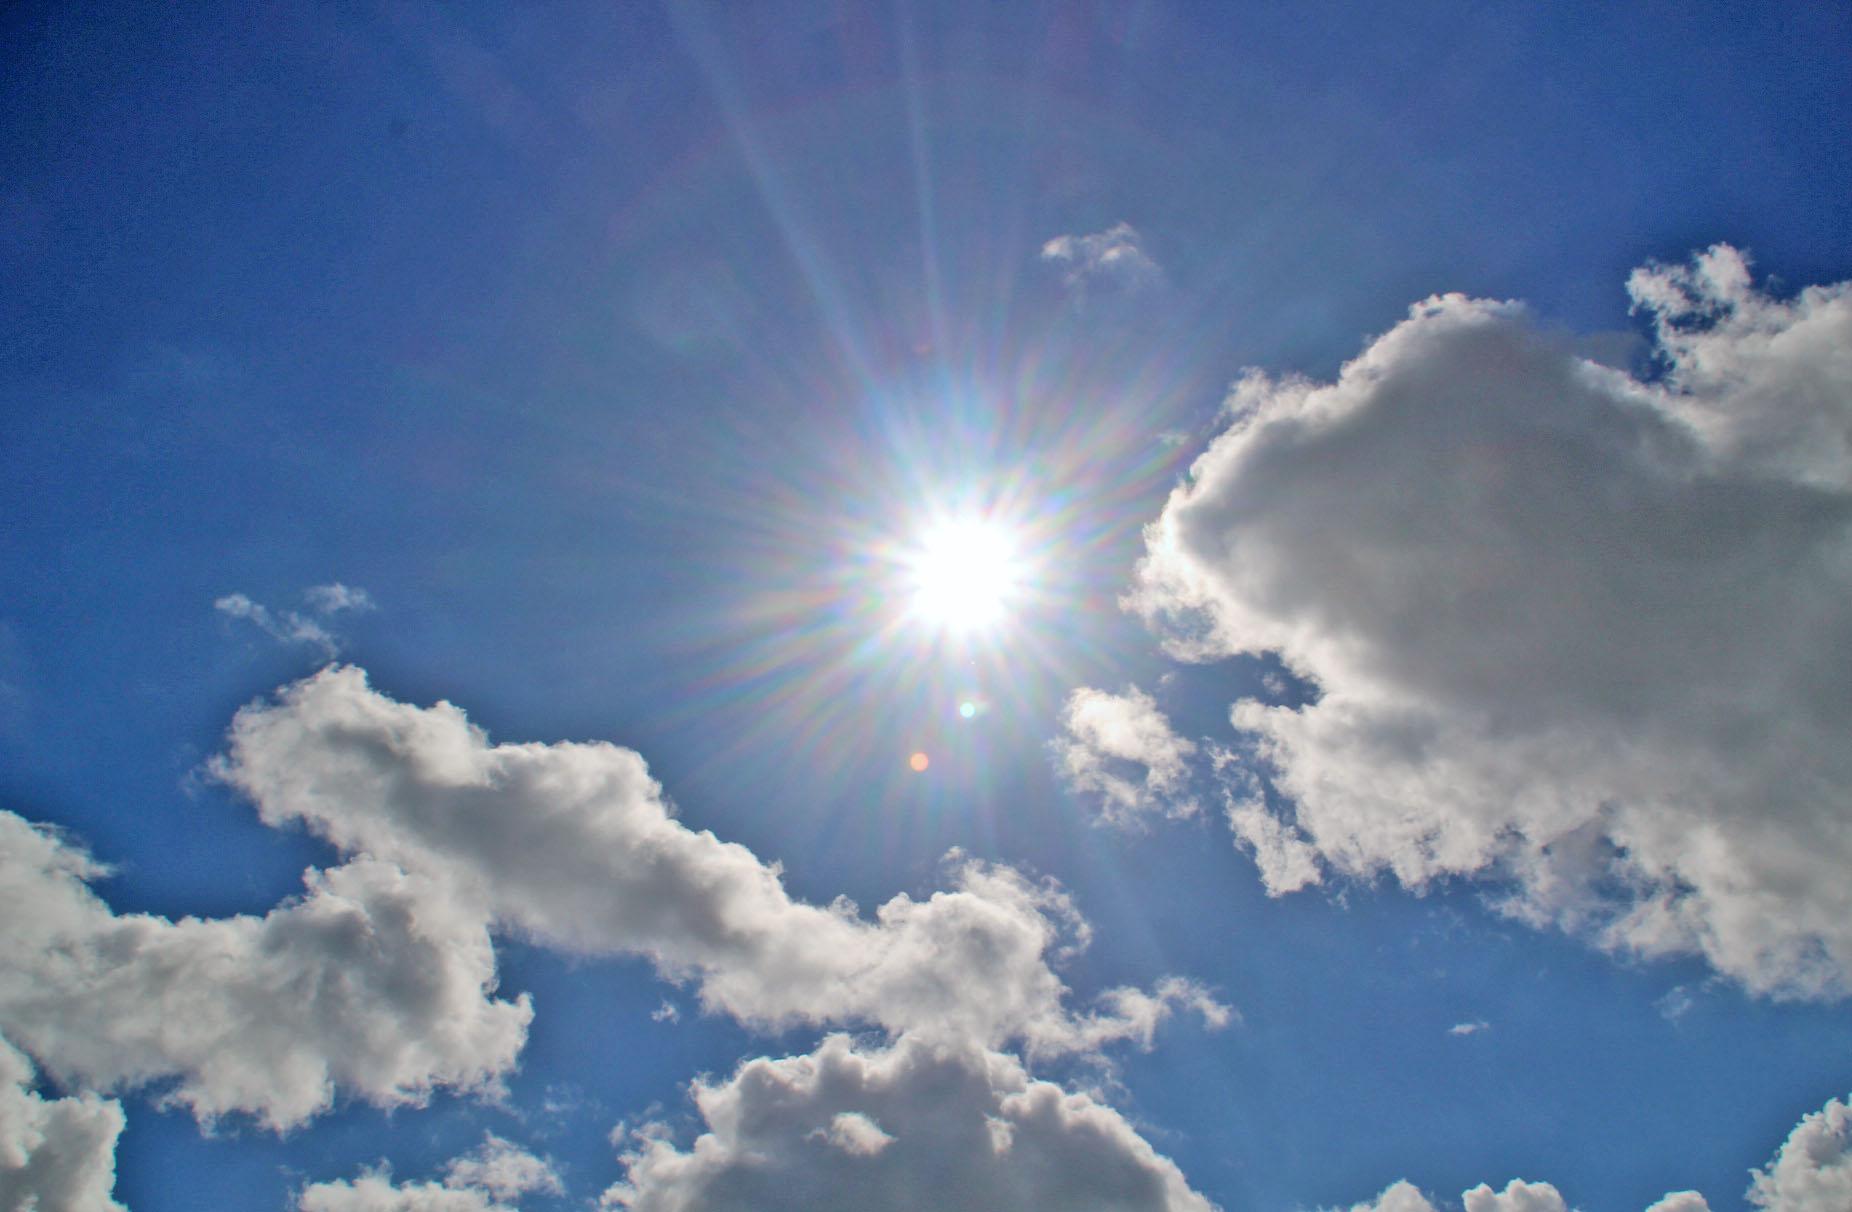 sun hits the sky, supergrass, Photography, #MySundayPhoto, sun, sky, clouds, dadbloguk, dadbloguk.com, dad blog uk, school run dad